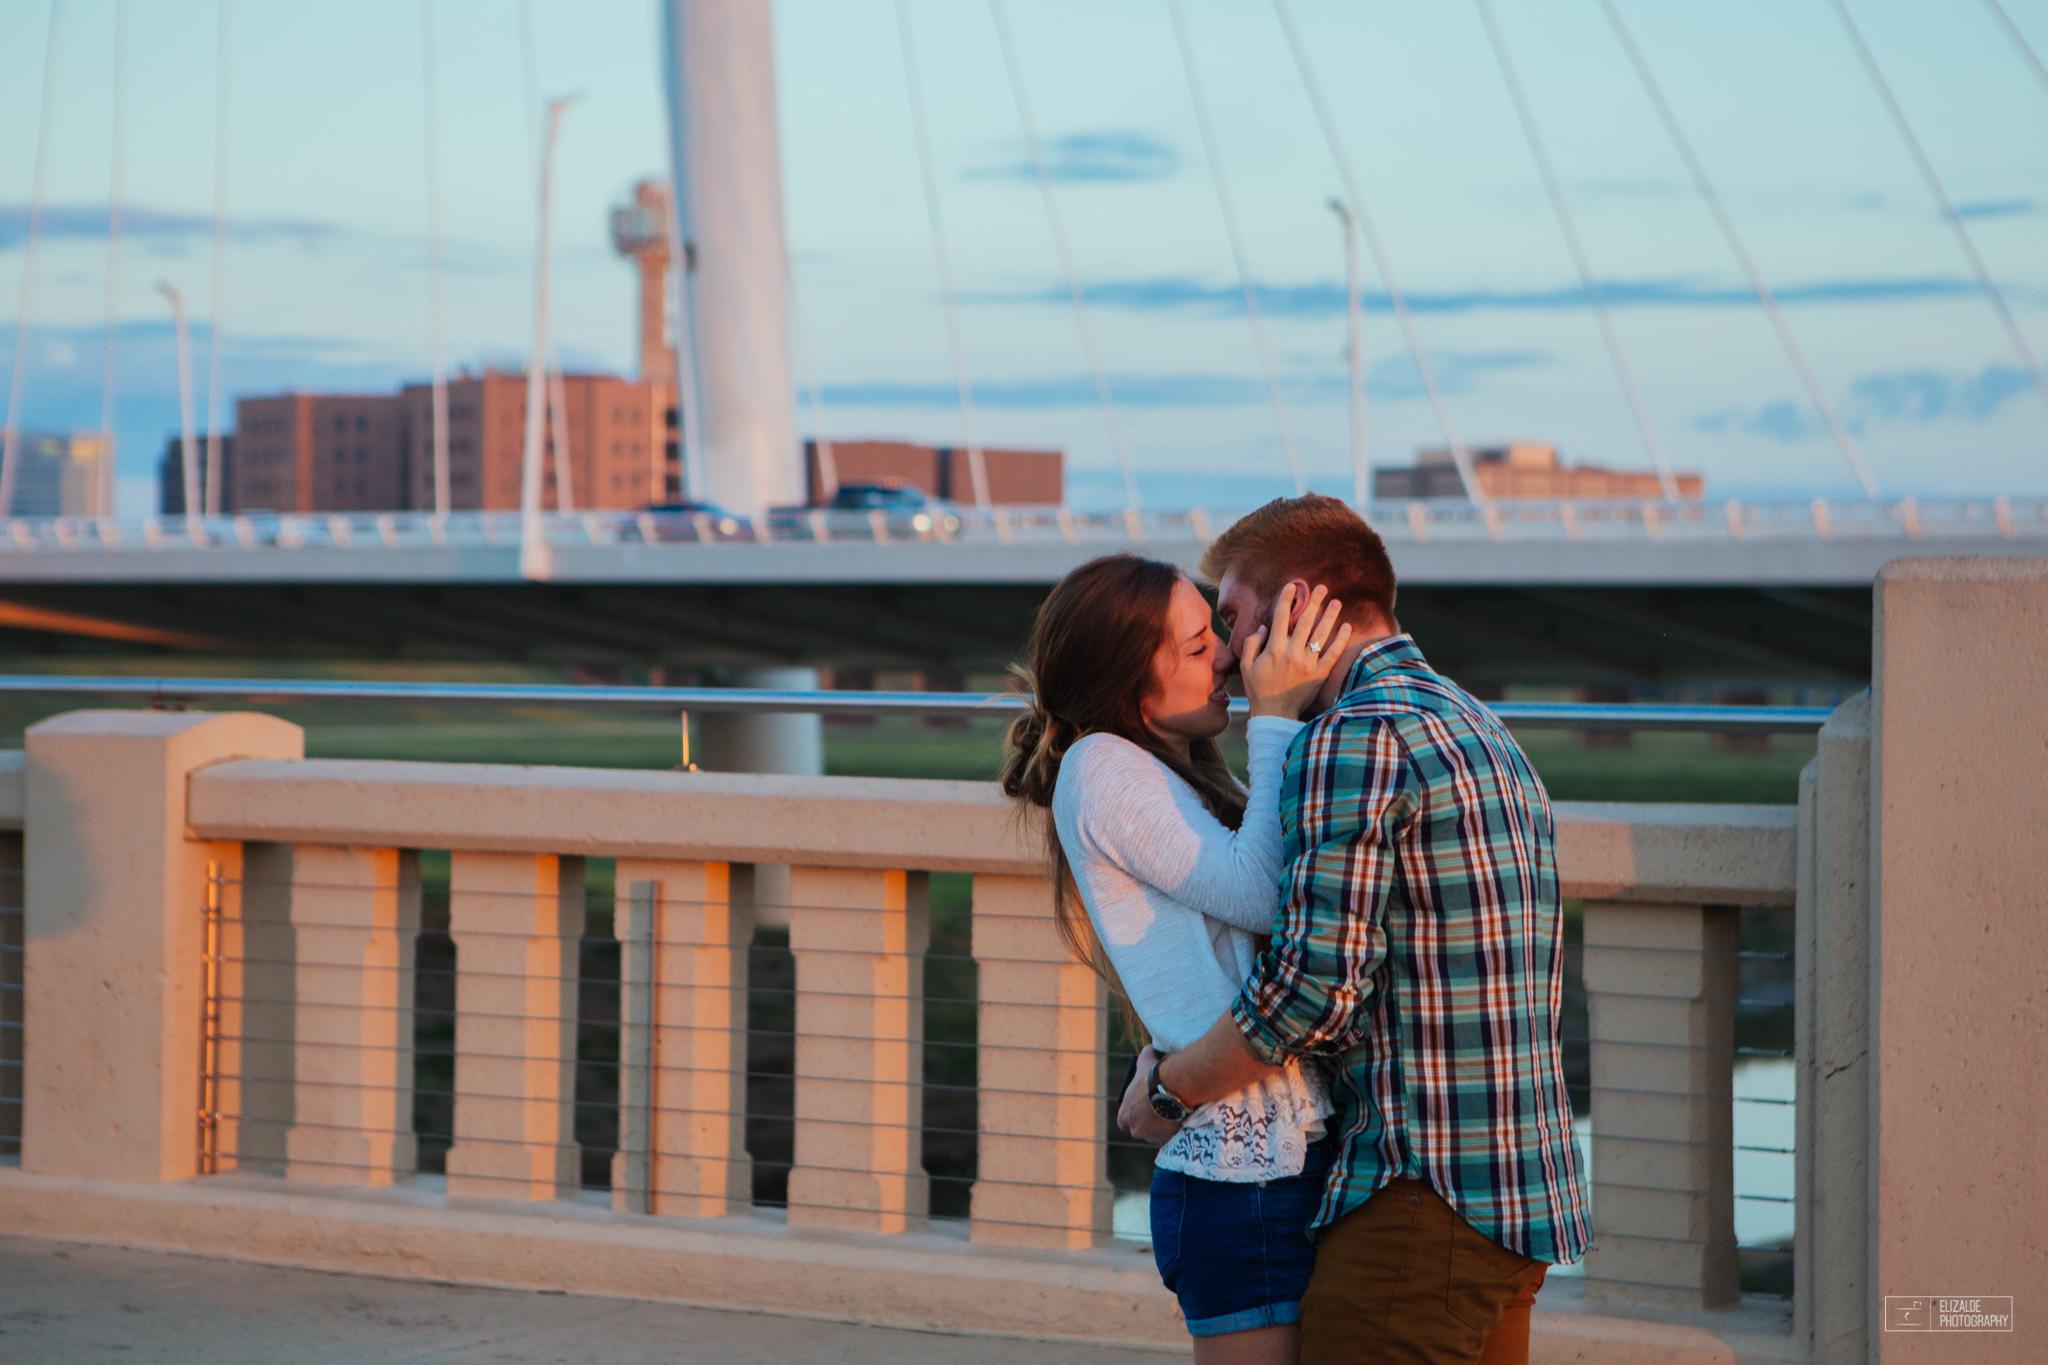 Proposal_DFW Wedding Photographer_Dallas Photographer_Elizalde Photography_margaret hunt hill bridge (9 of 21).jpg